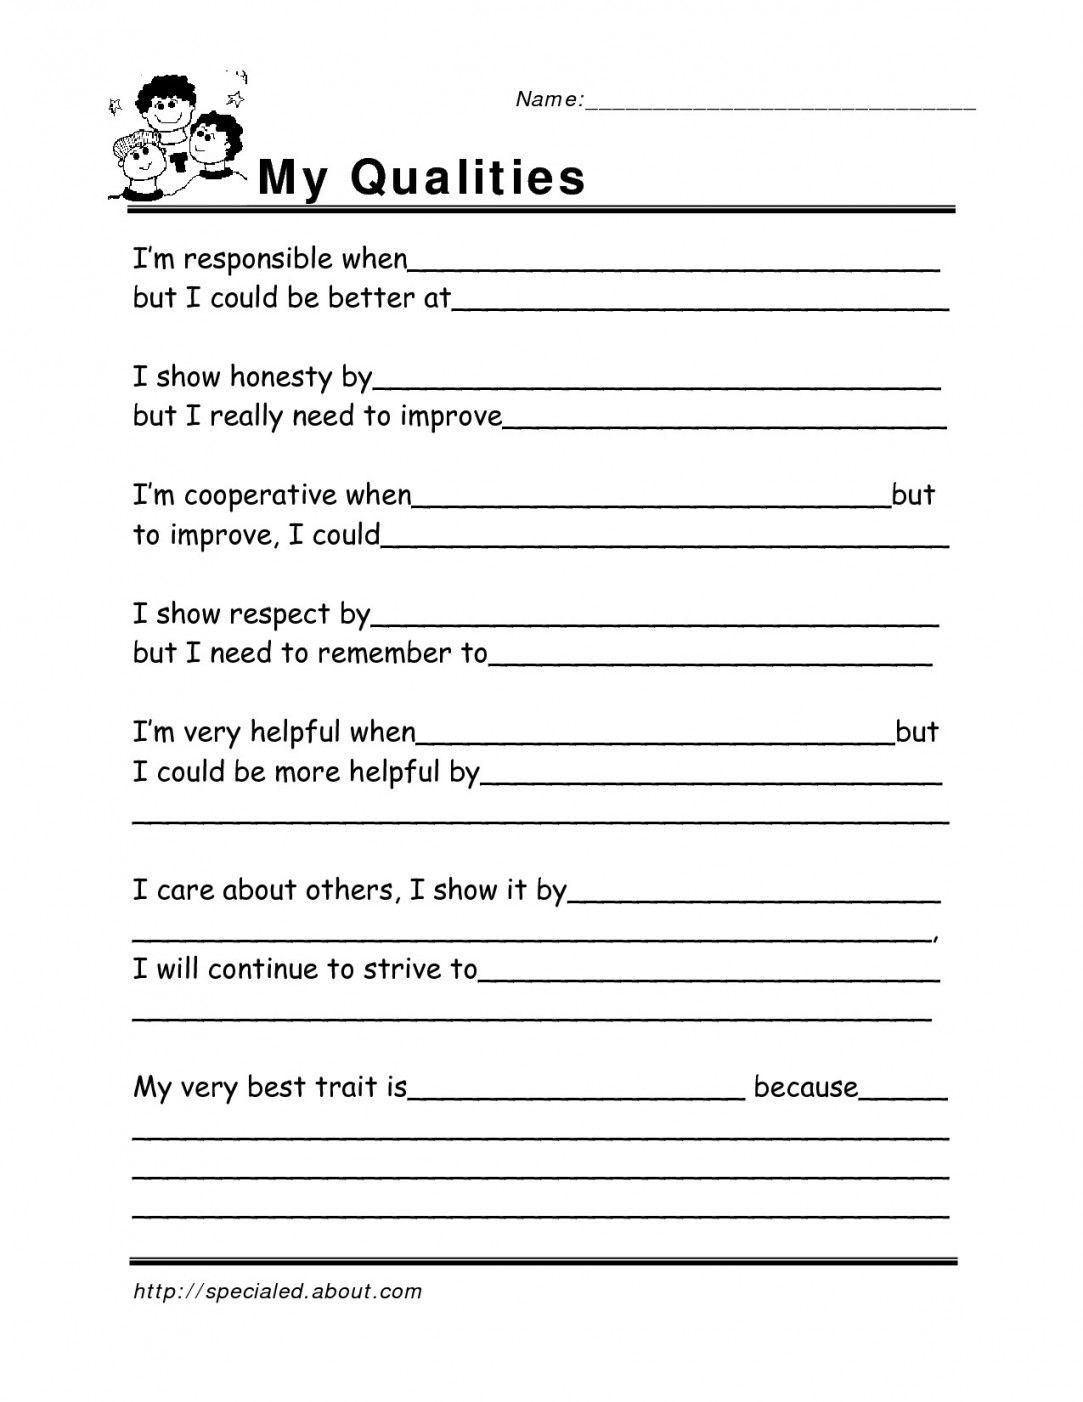 Free Printable Life Skills Worksheets | Lostranquillos - Free | Free Printable Life Skills Worksheets